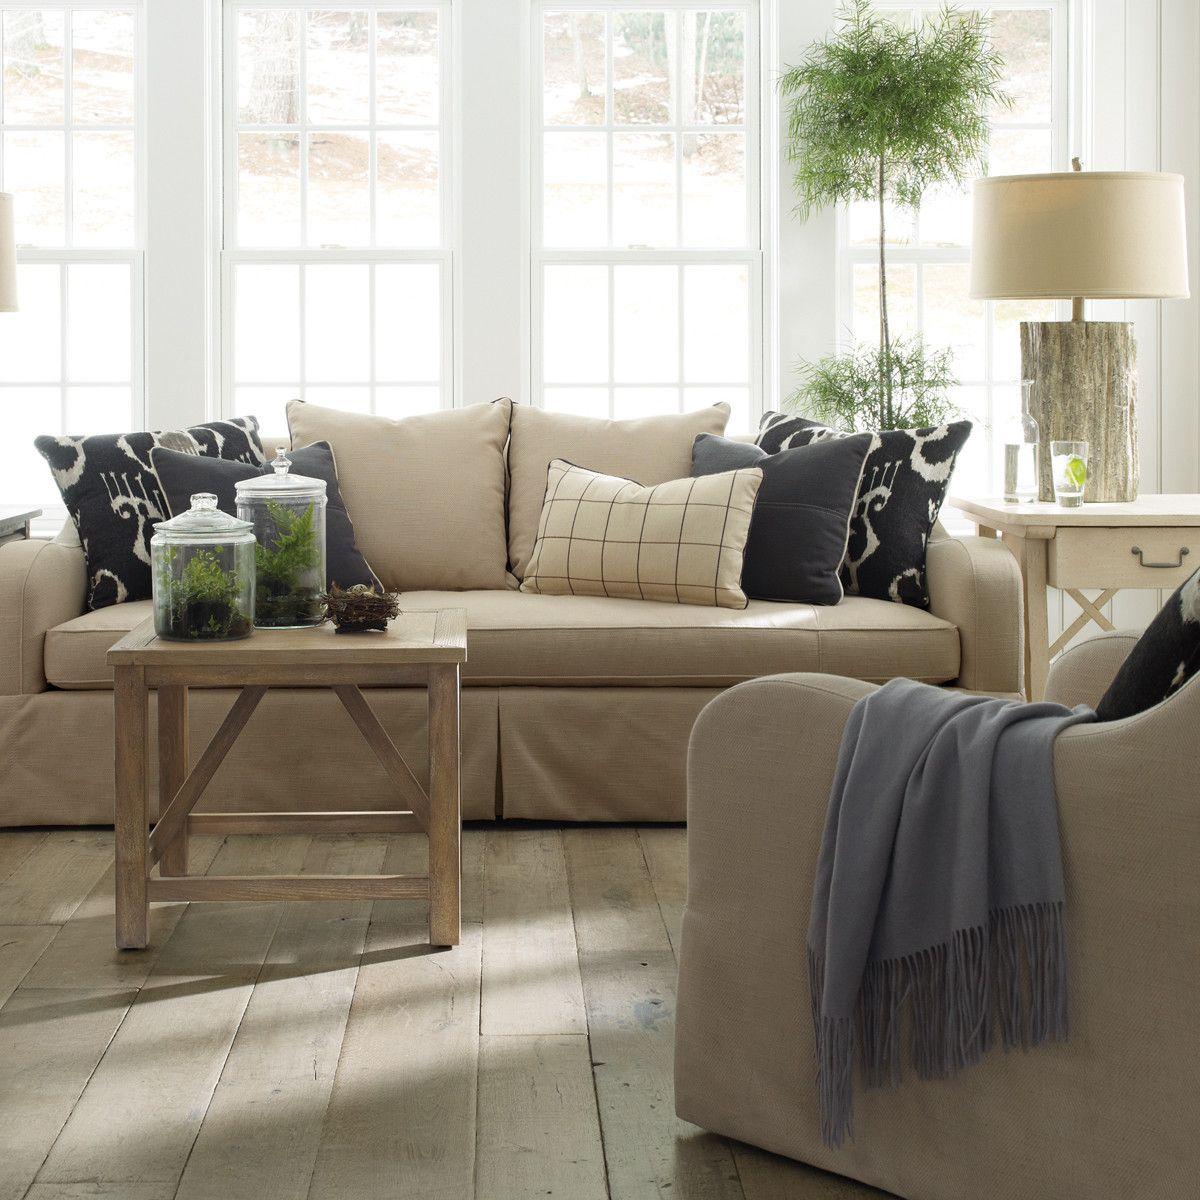 Scandinavian Interiordesign Colors: FLORIDA BRUSHED SIDE TABLE